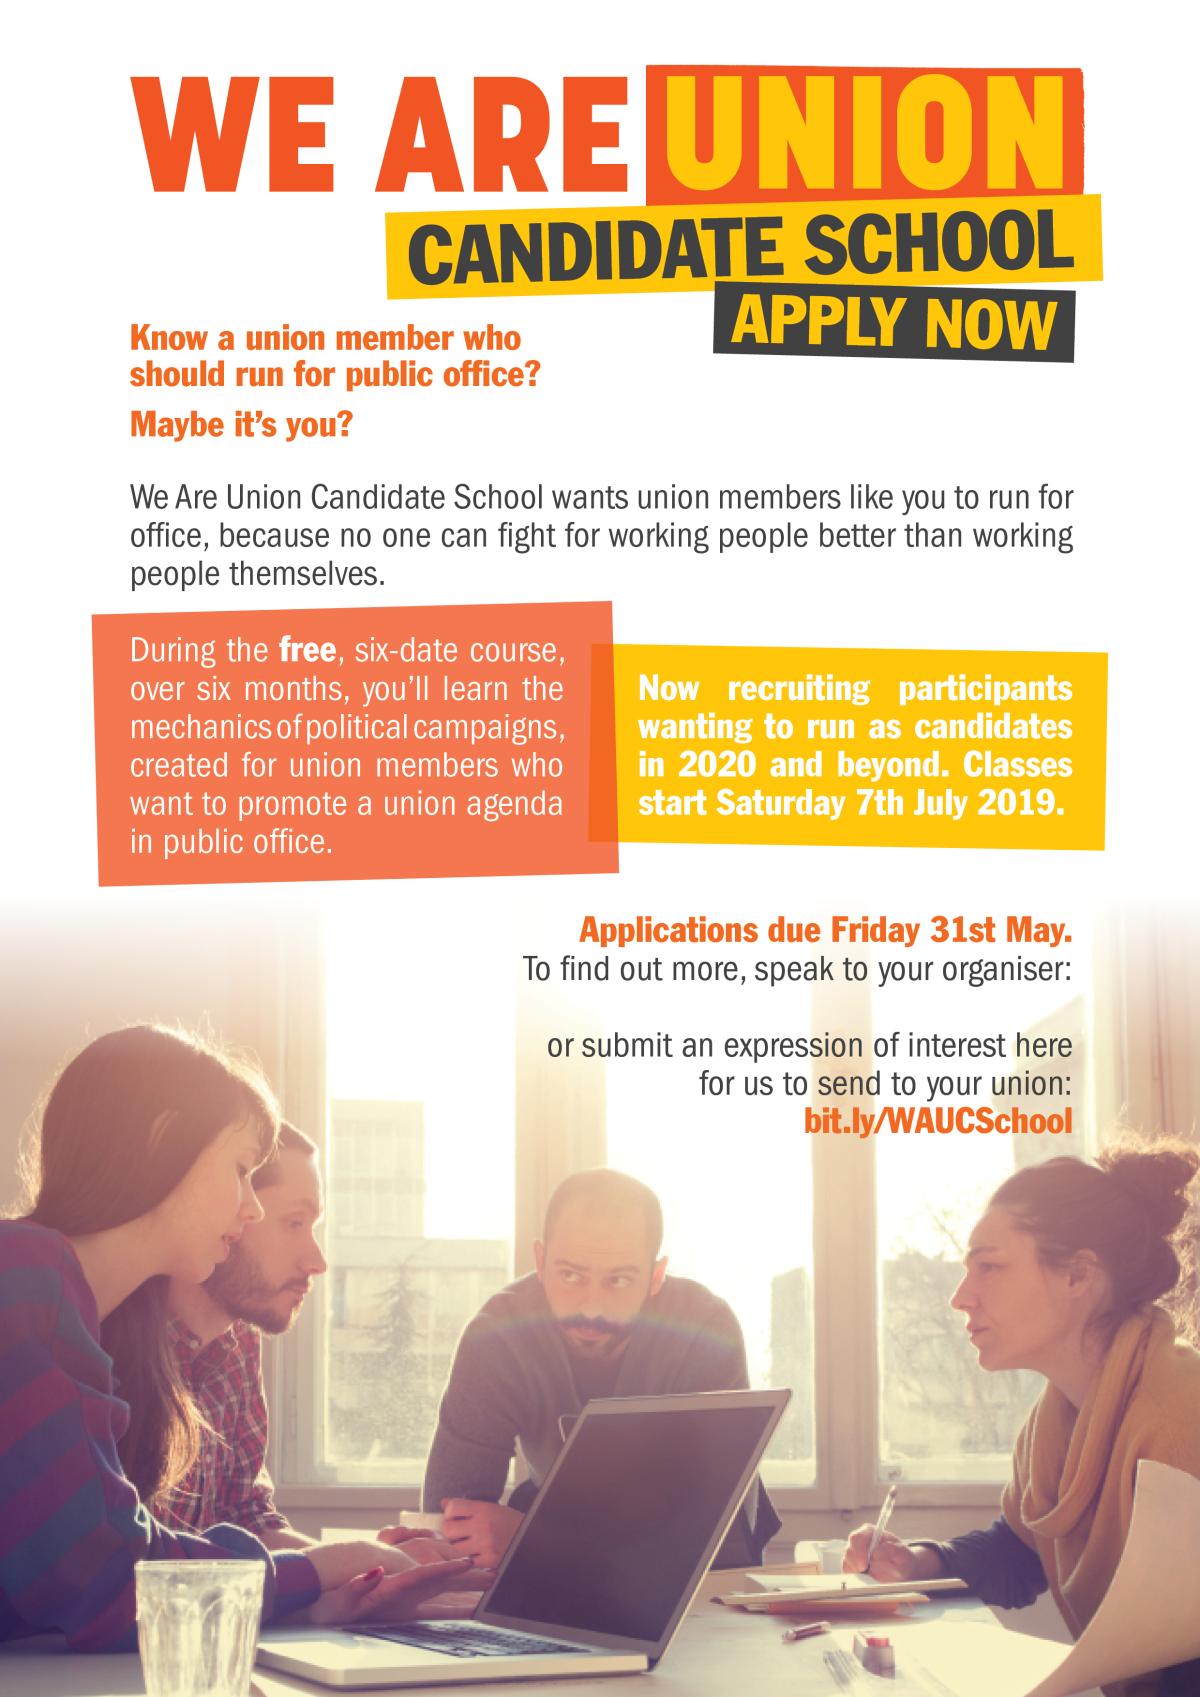 CandidateSchool (1)